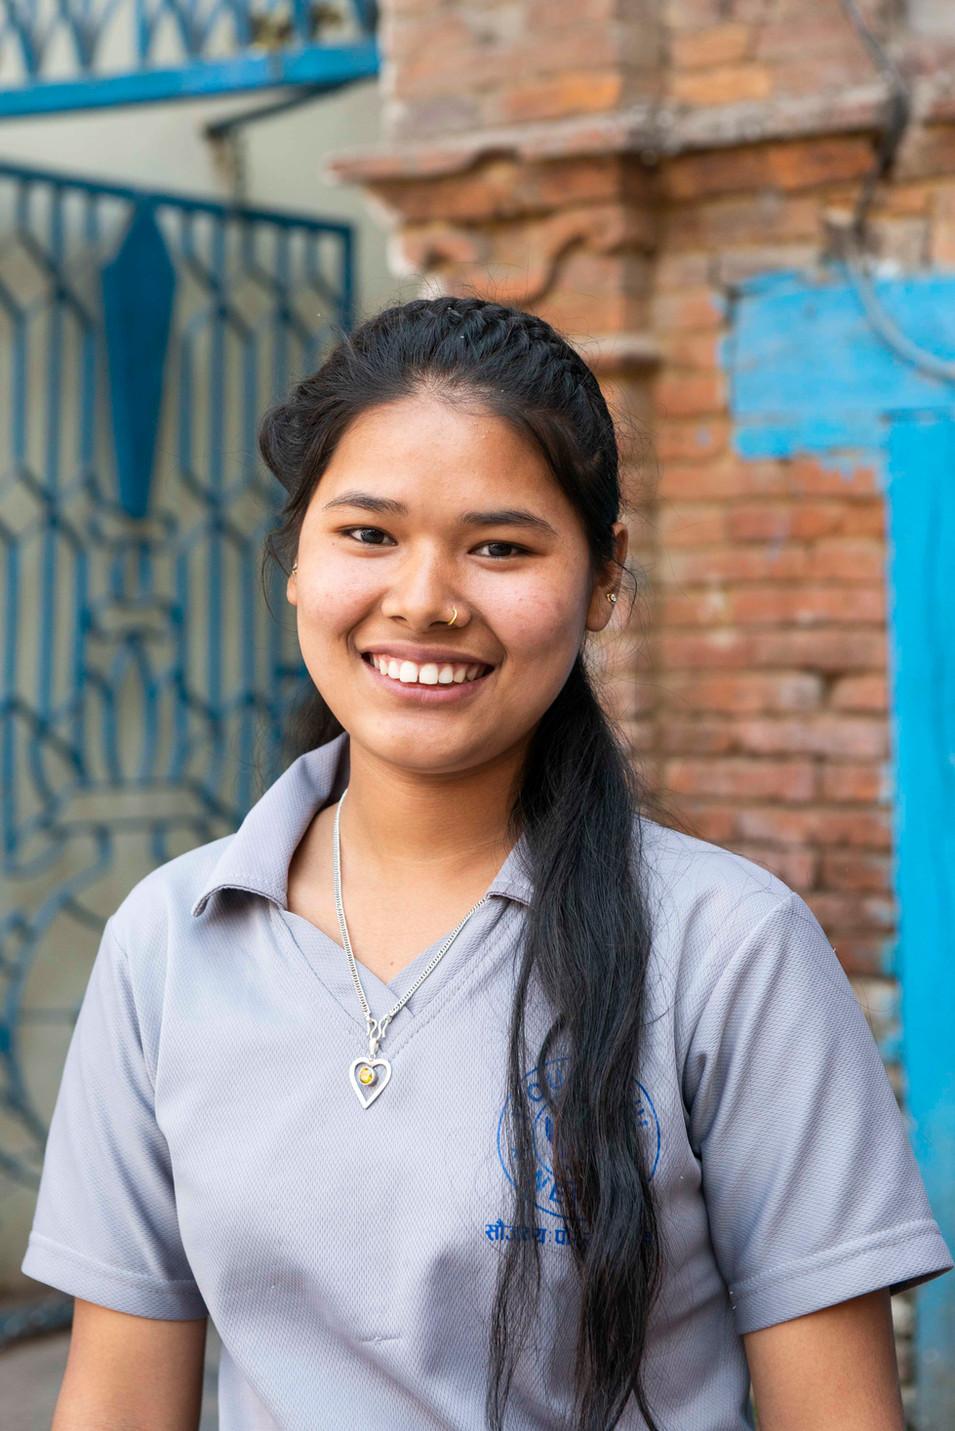 Tdh_Nepal_Marie-LouDumauthioz_476.jpg